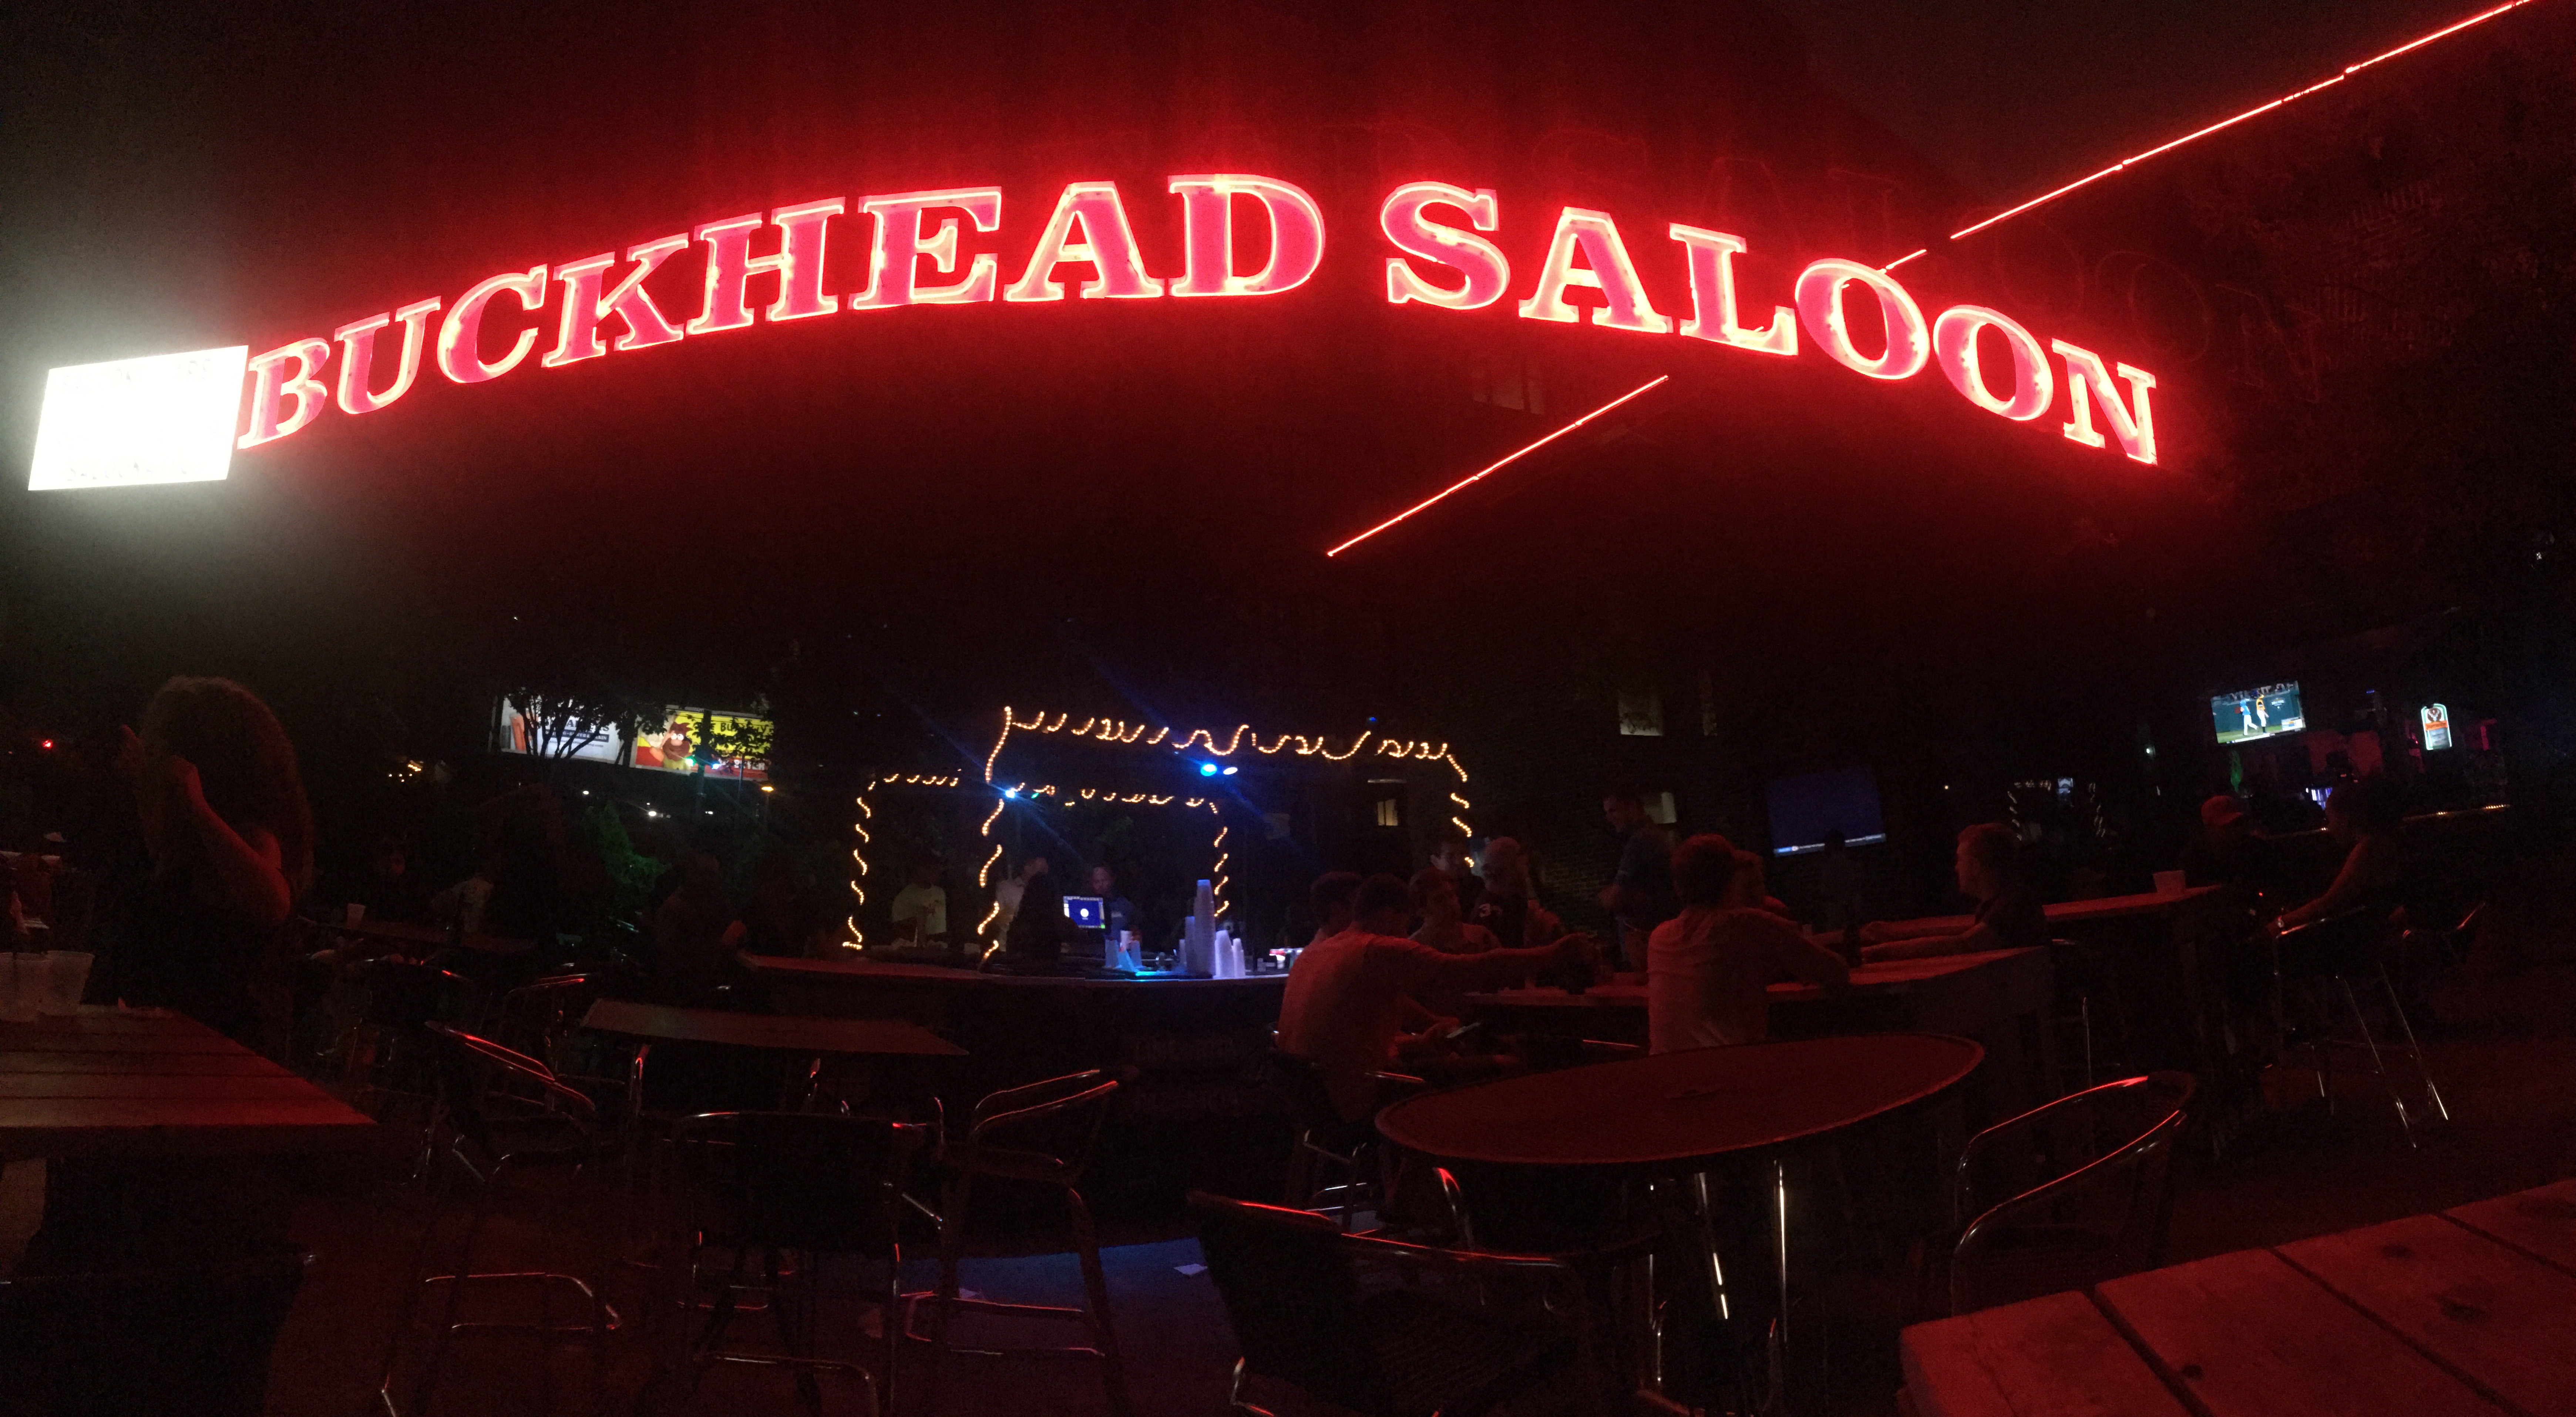 Buckhead Sign